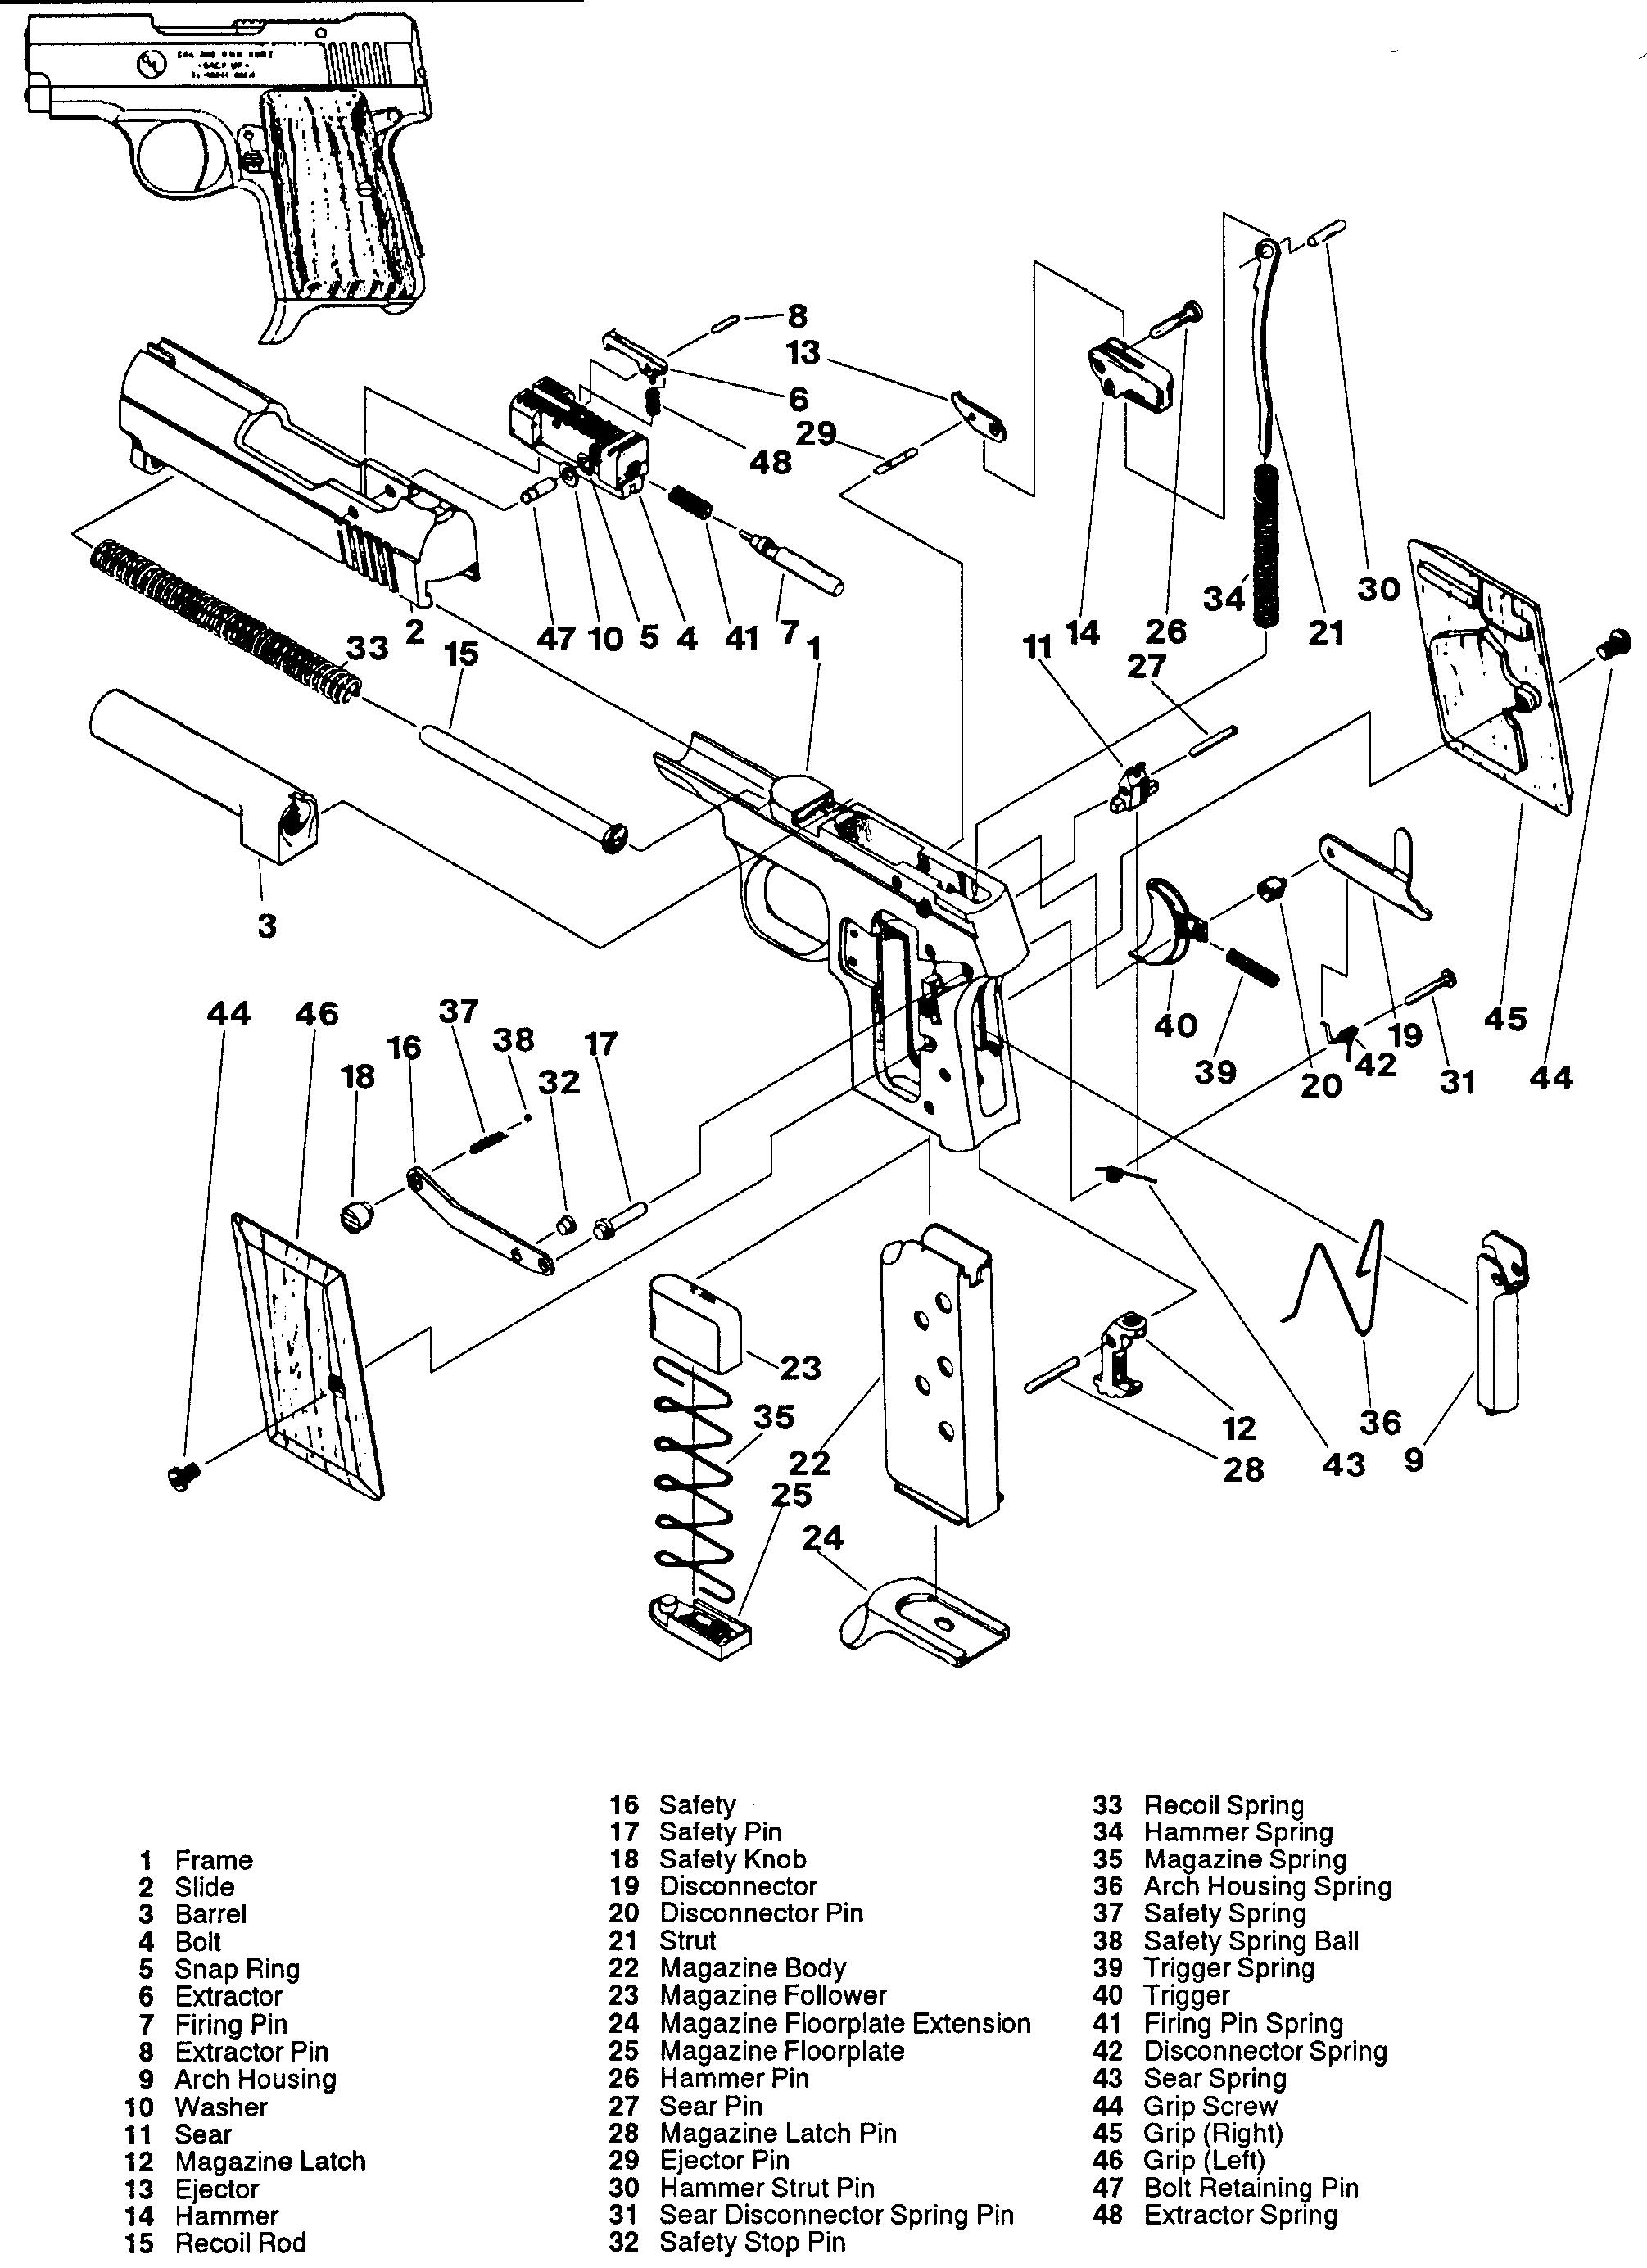 Misure Taurus 25 Acp Schematic 380backup